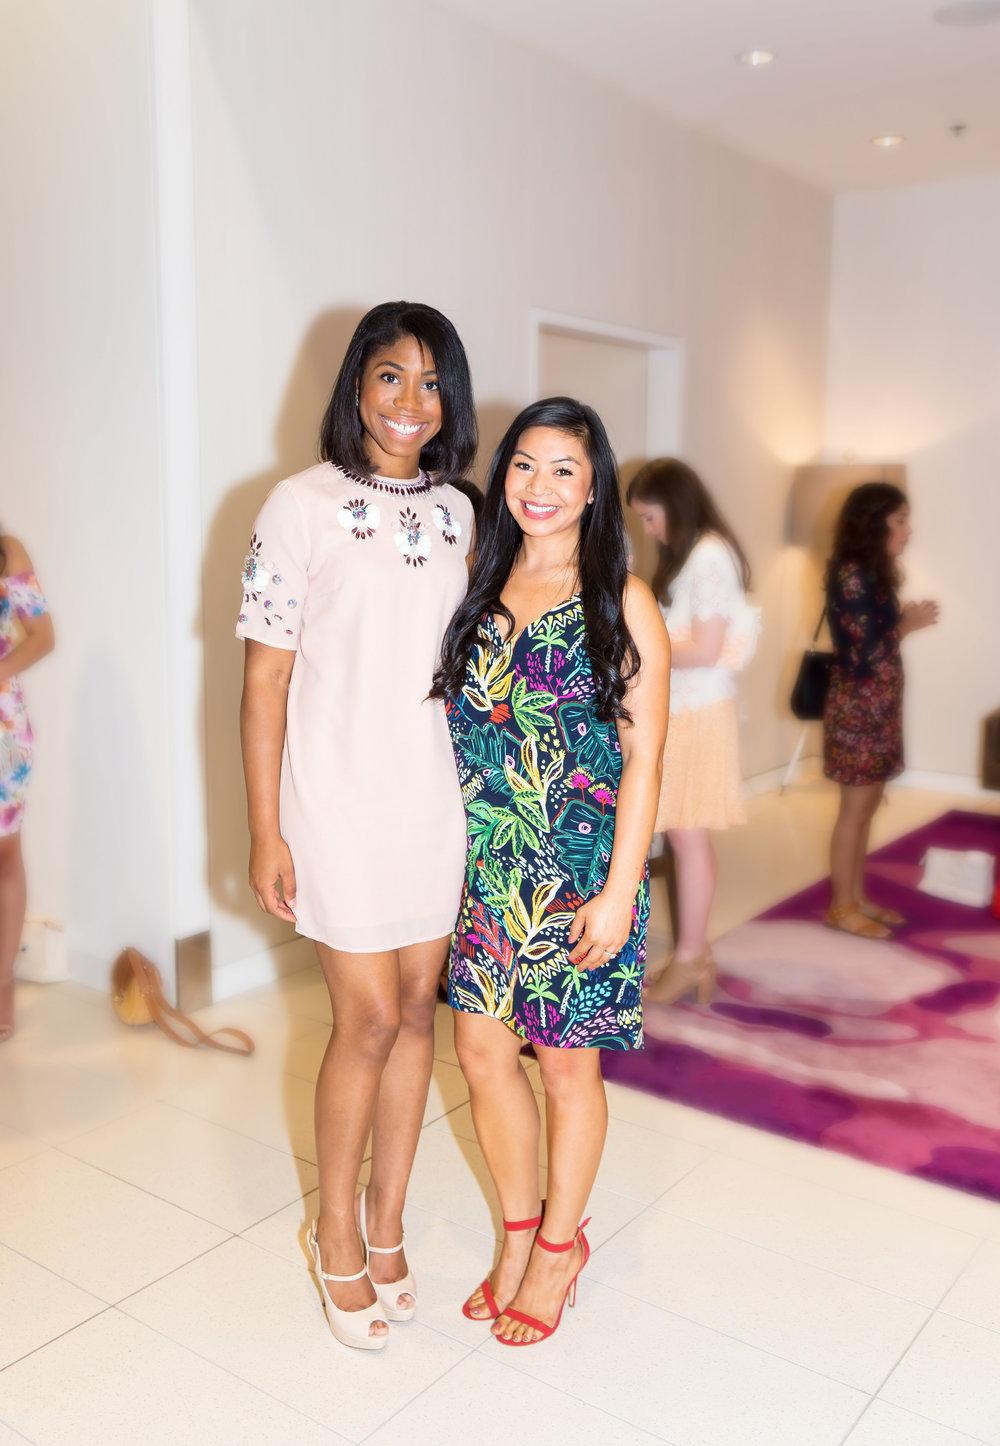 Lynn  and I at The Houston Blogger Brunch.Photo Courtesy of Diamond Oak Photography.